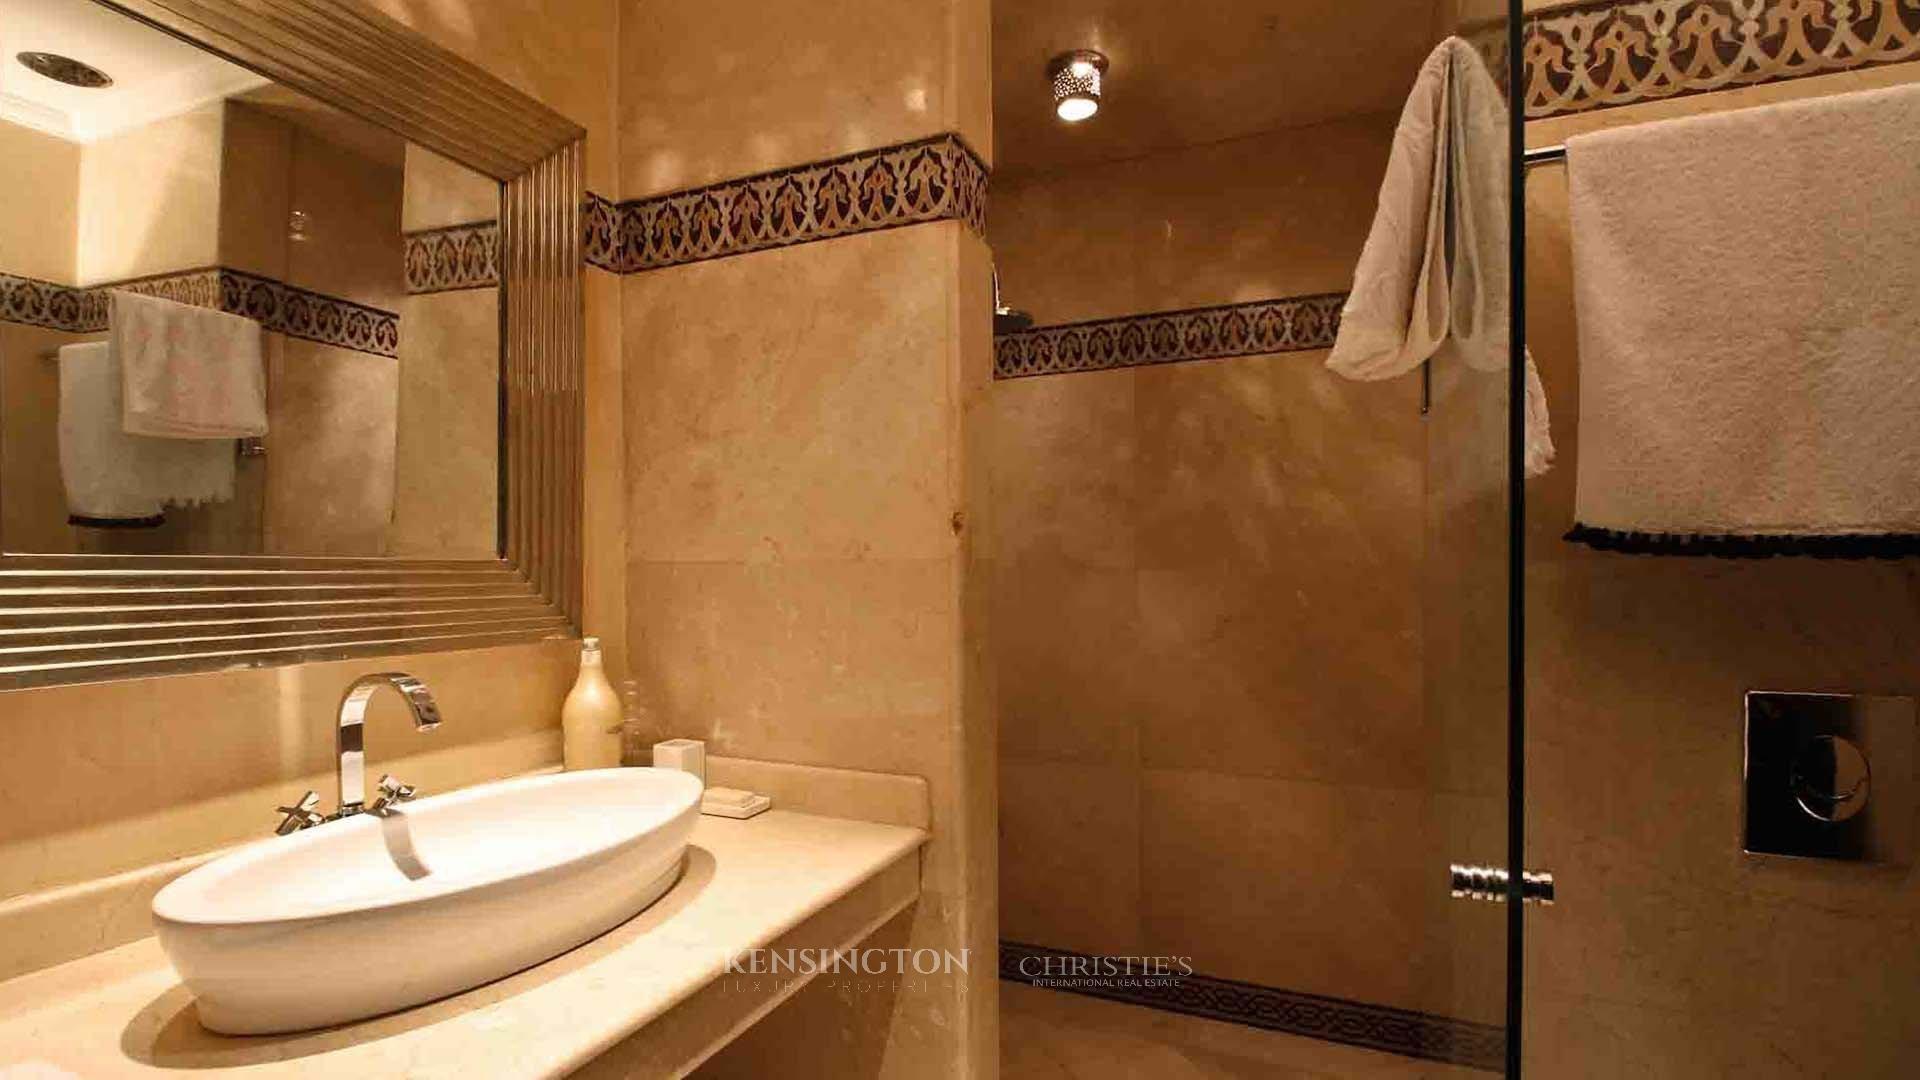 KPPM00782: Gueliz Penthouse Apartment Marrakech Morocco